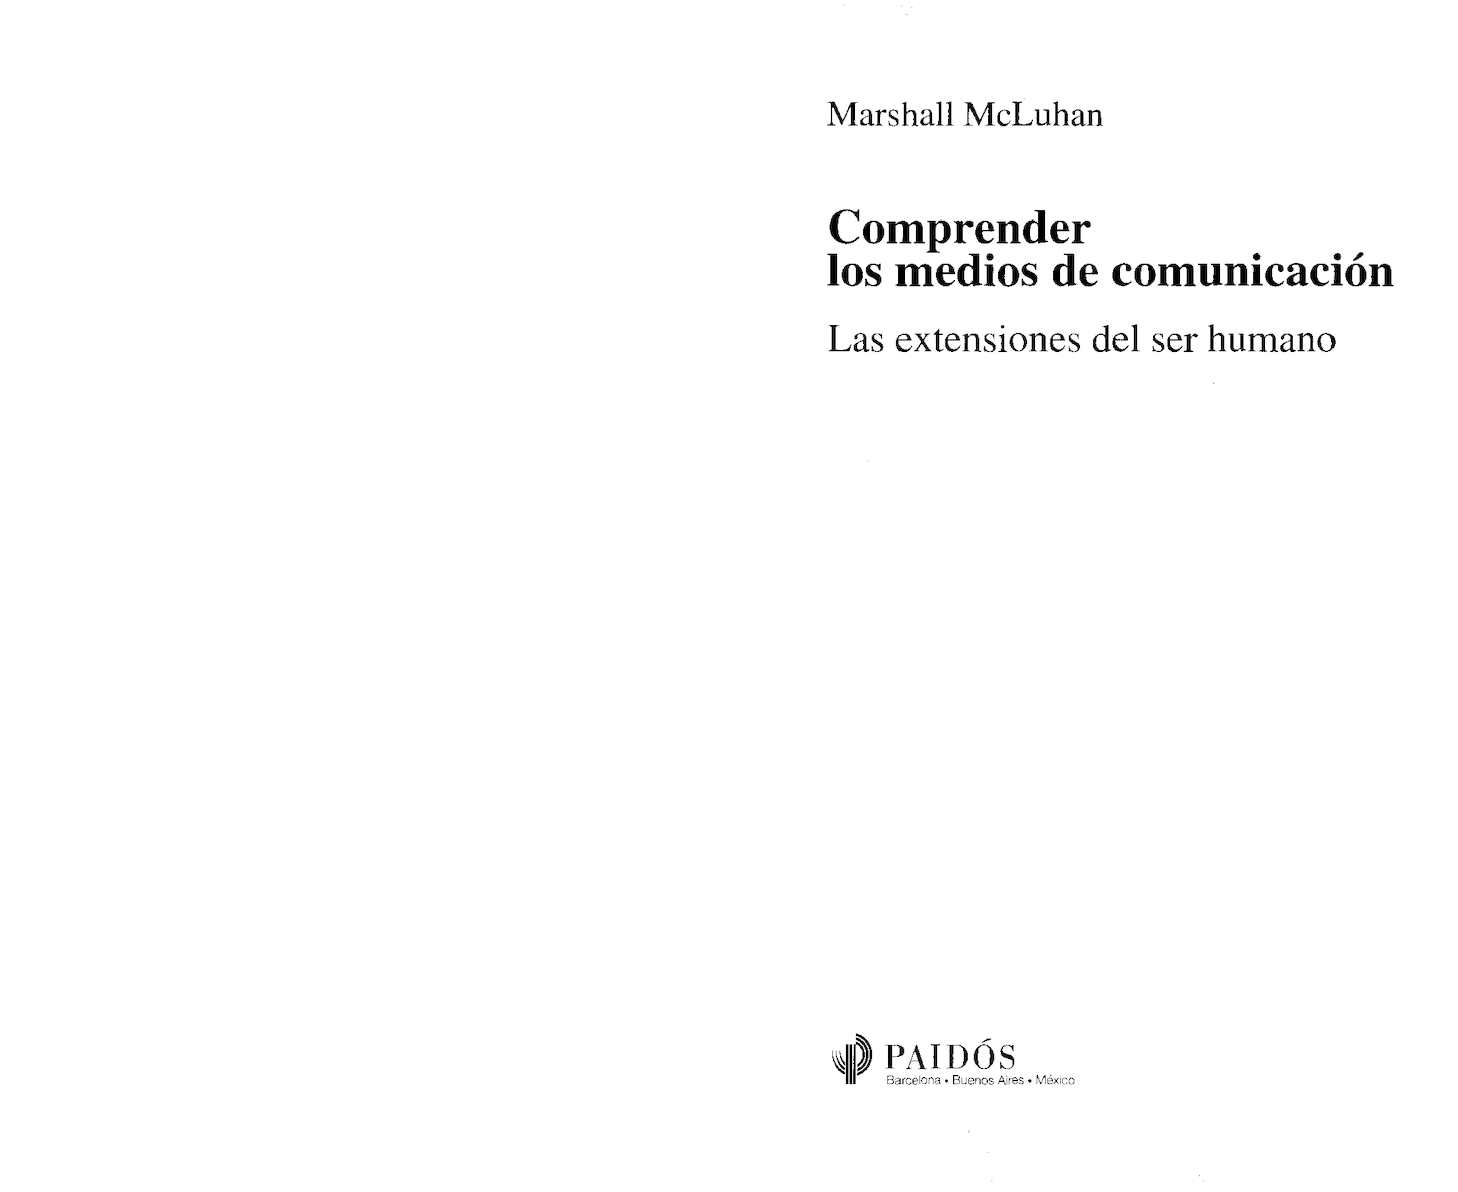 Calaméo - Mc Luhan Marshall Comprender Los Medios De Comunicacion 41a10caaae1